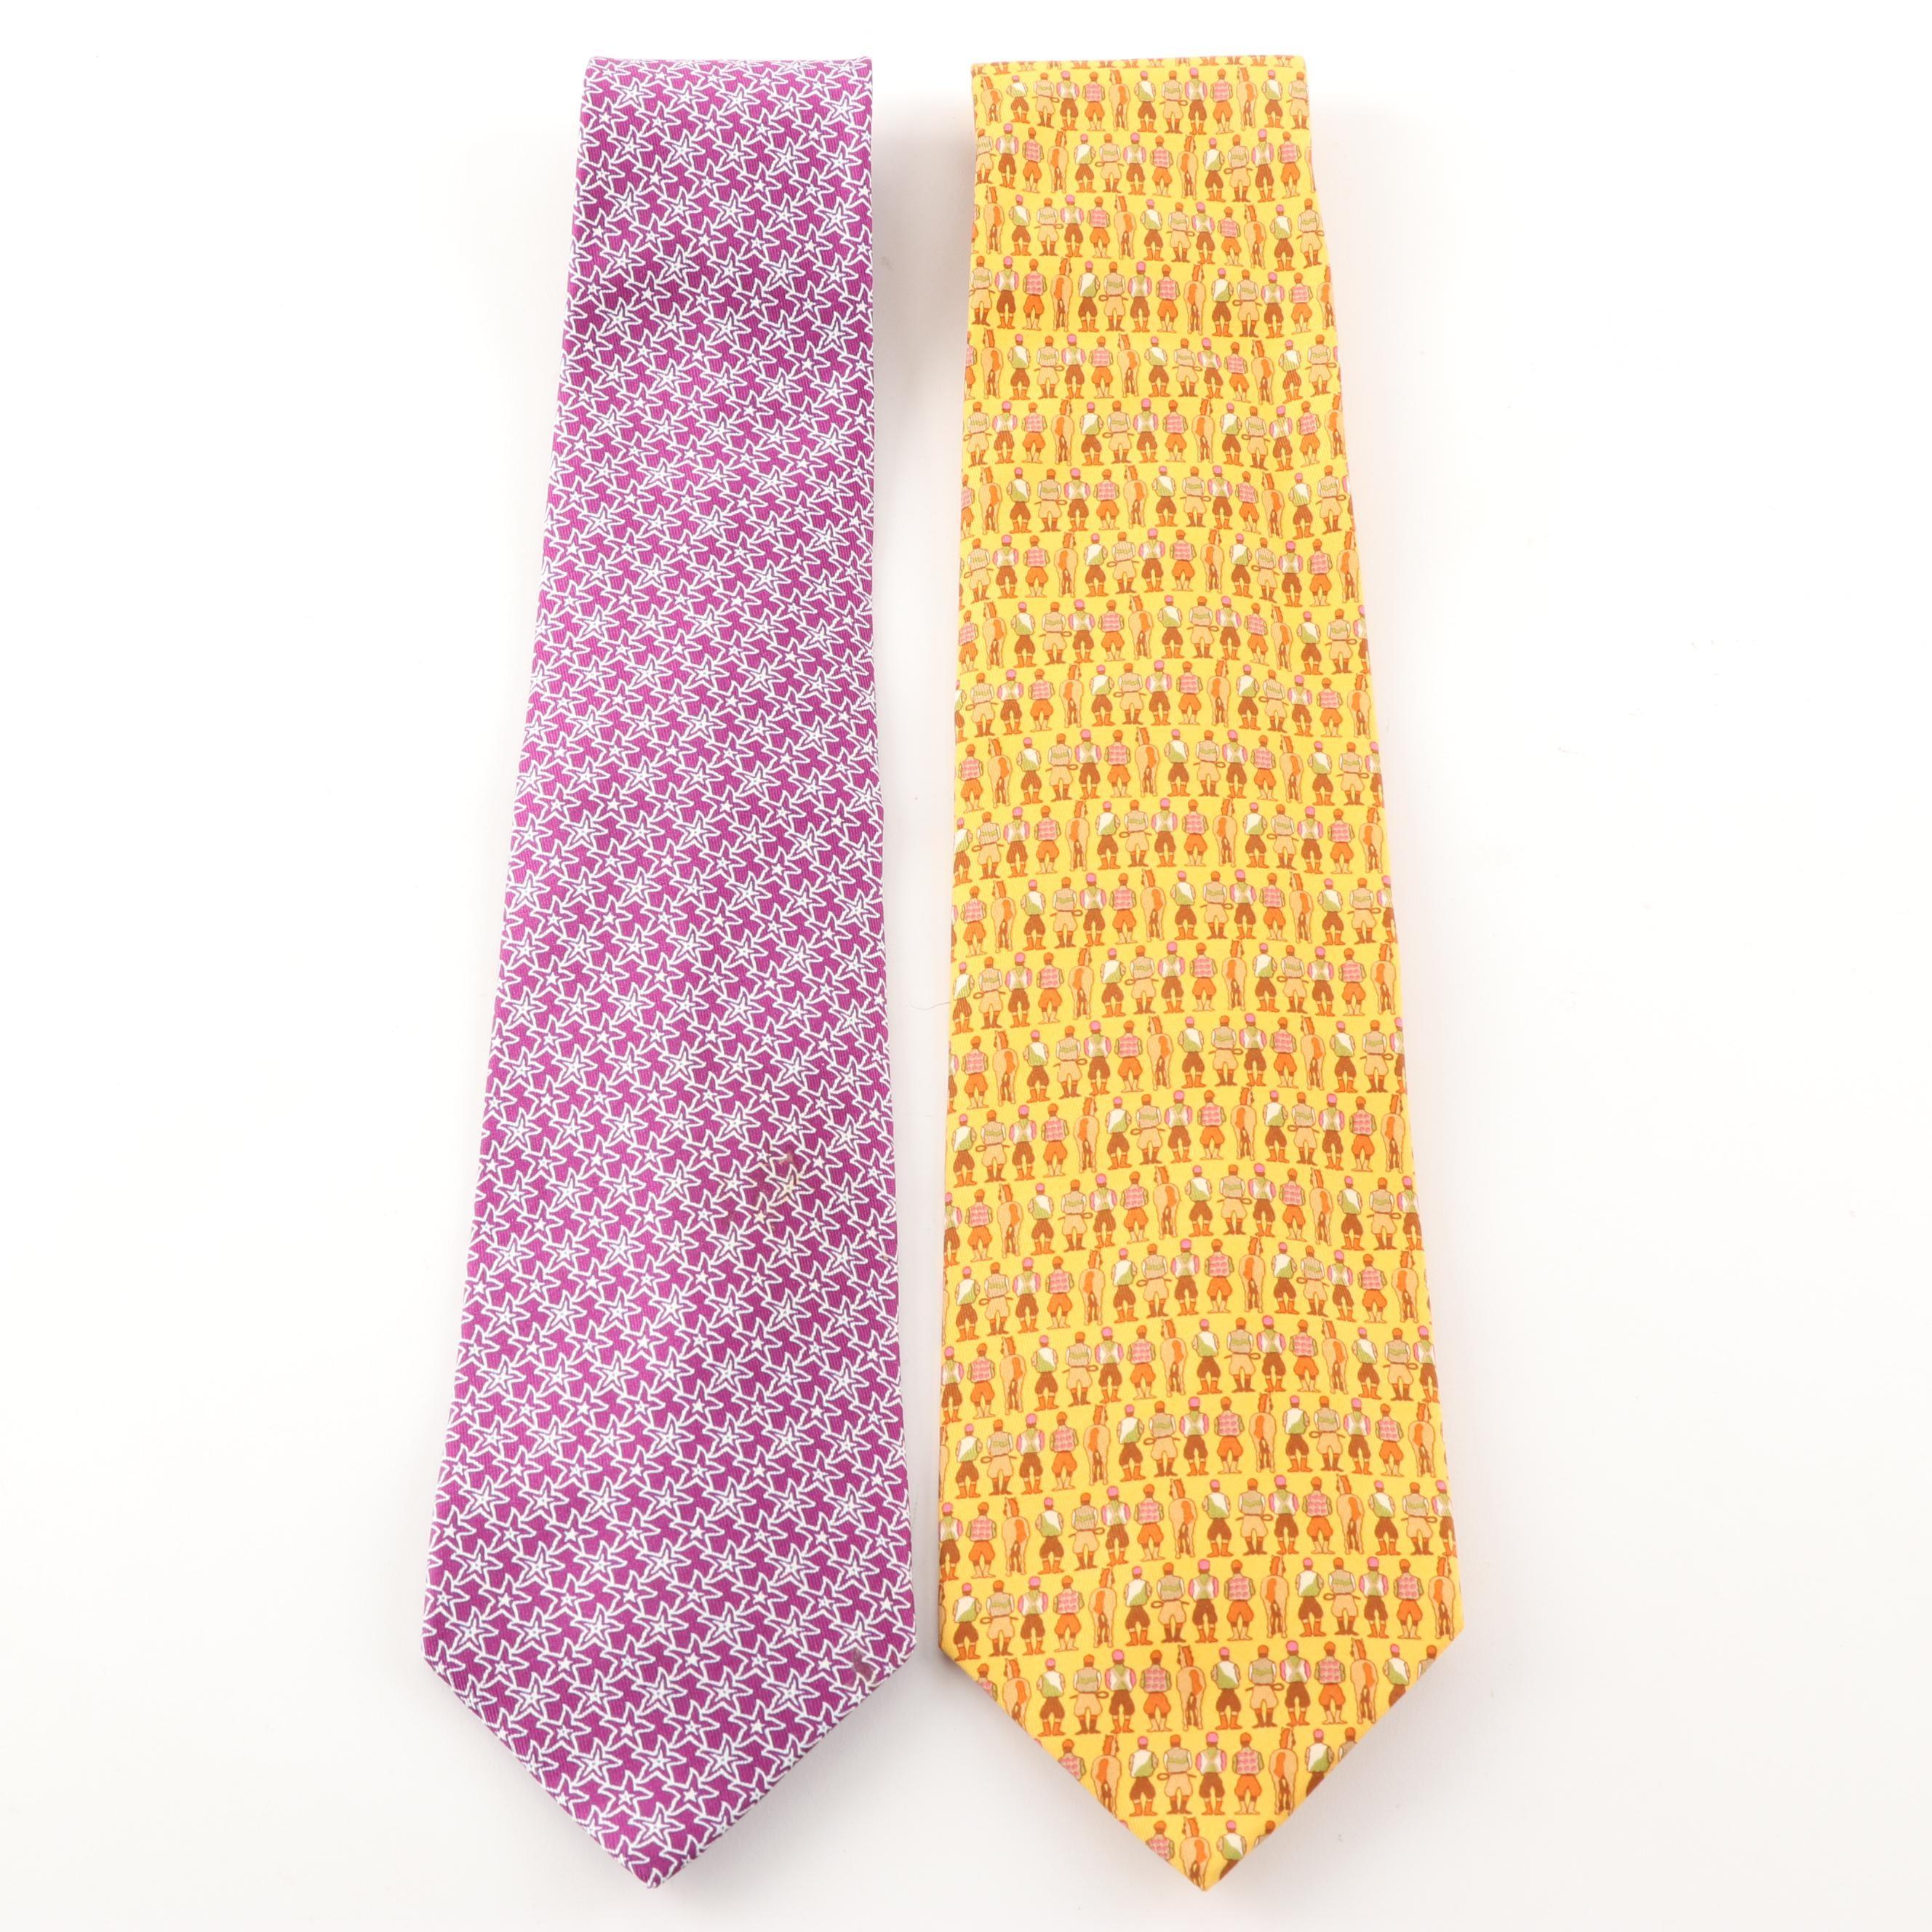 Salvatore Ferragamo Italian Silk Neckties